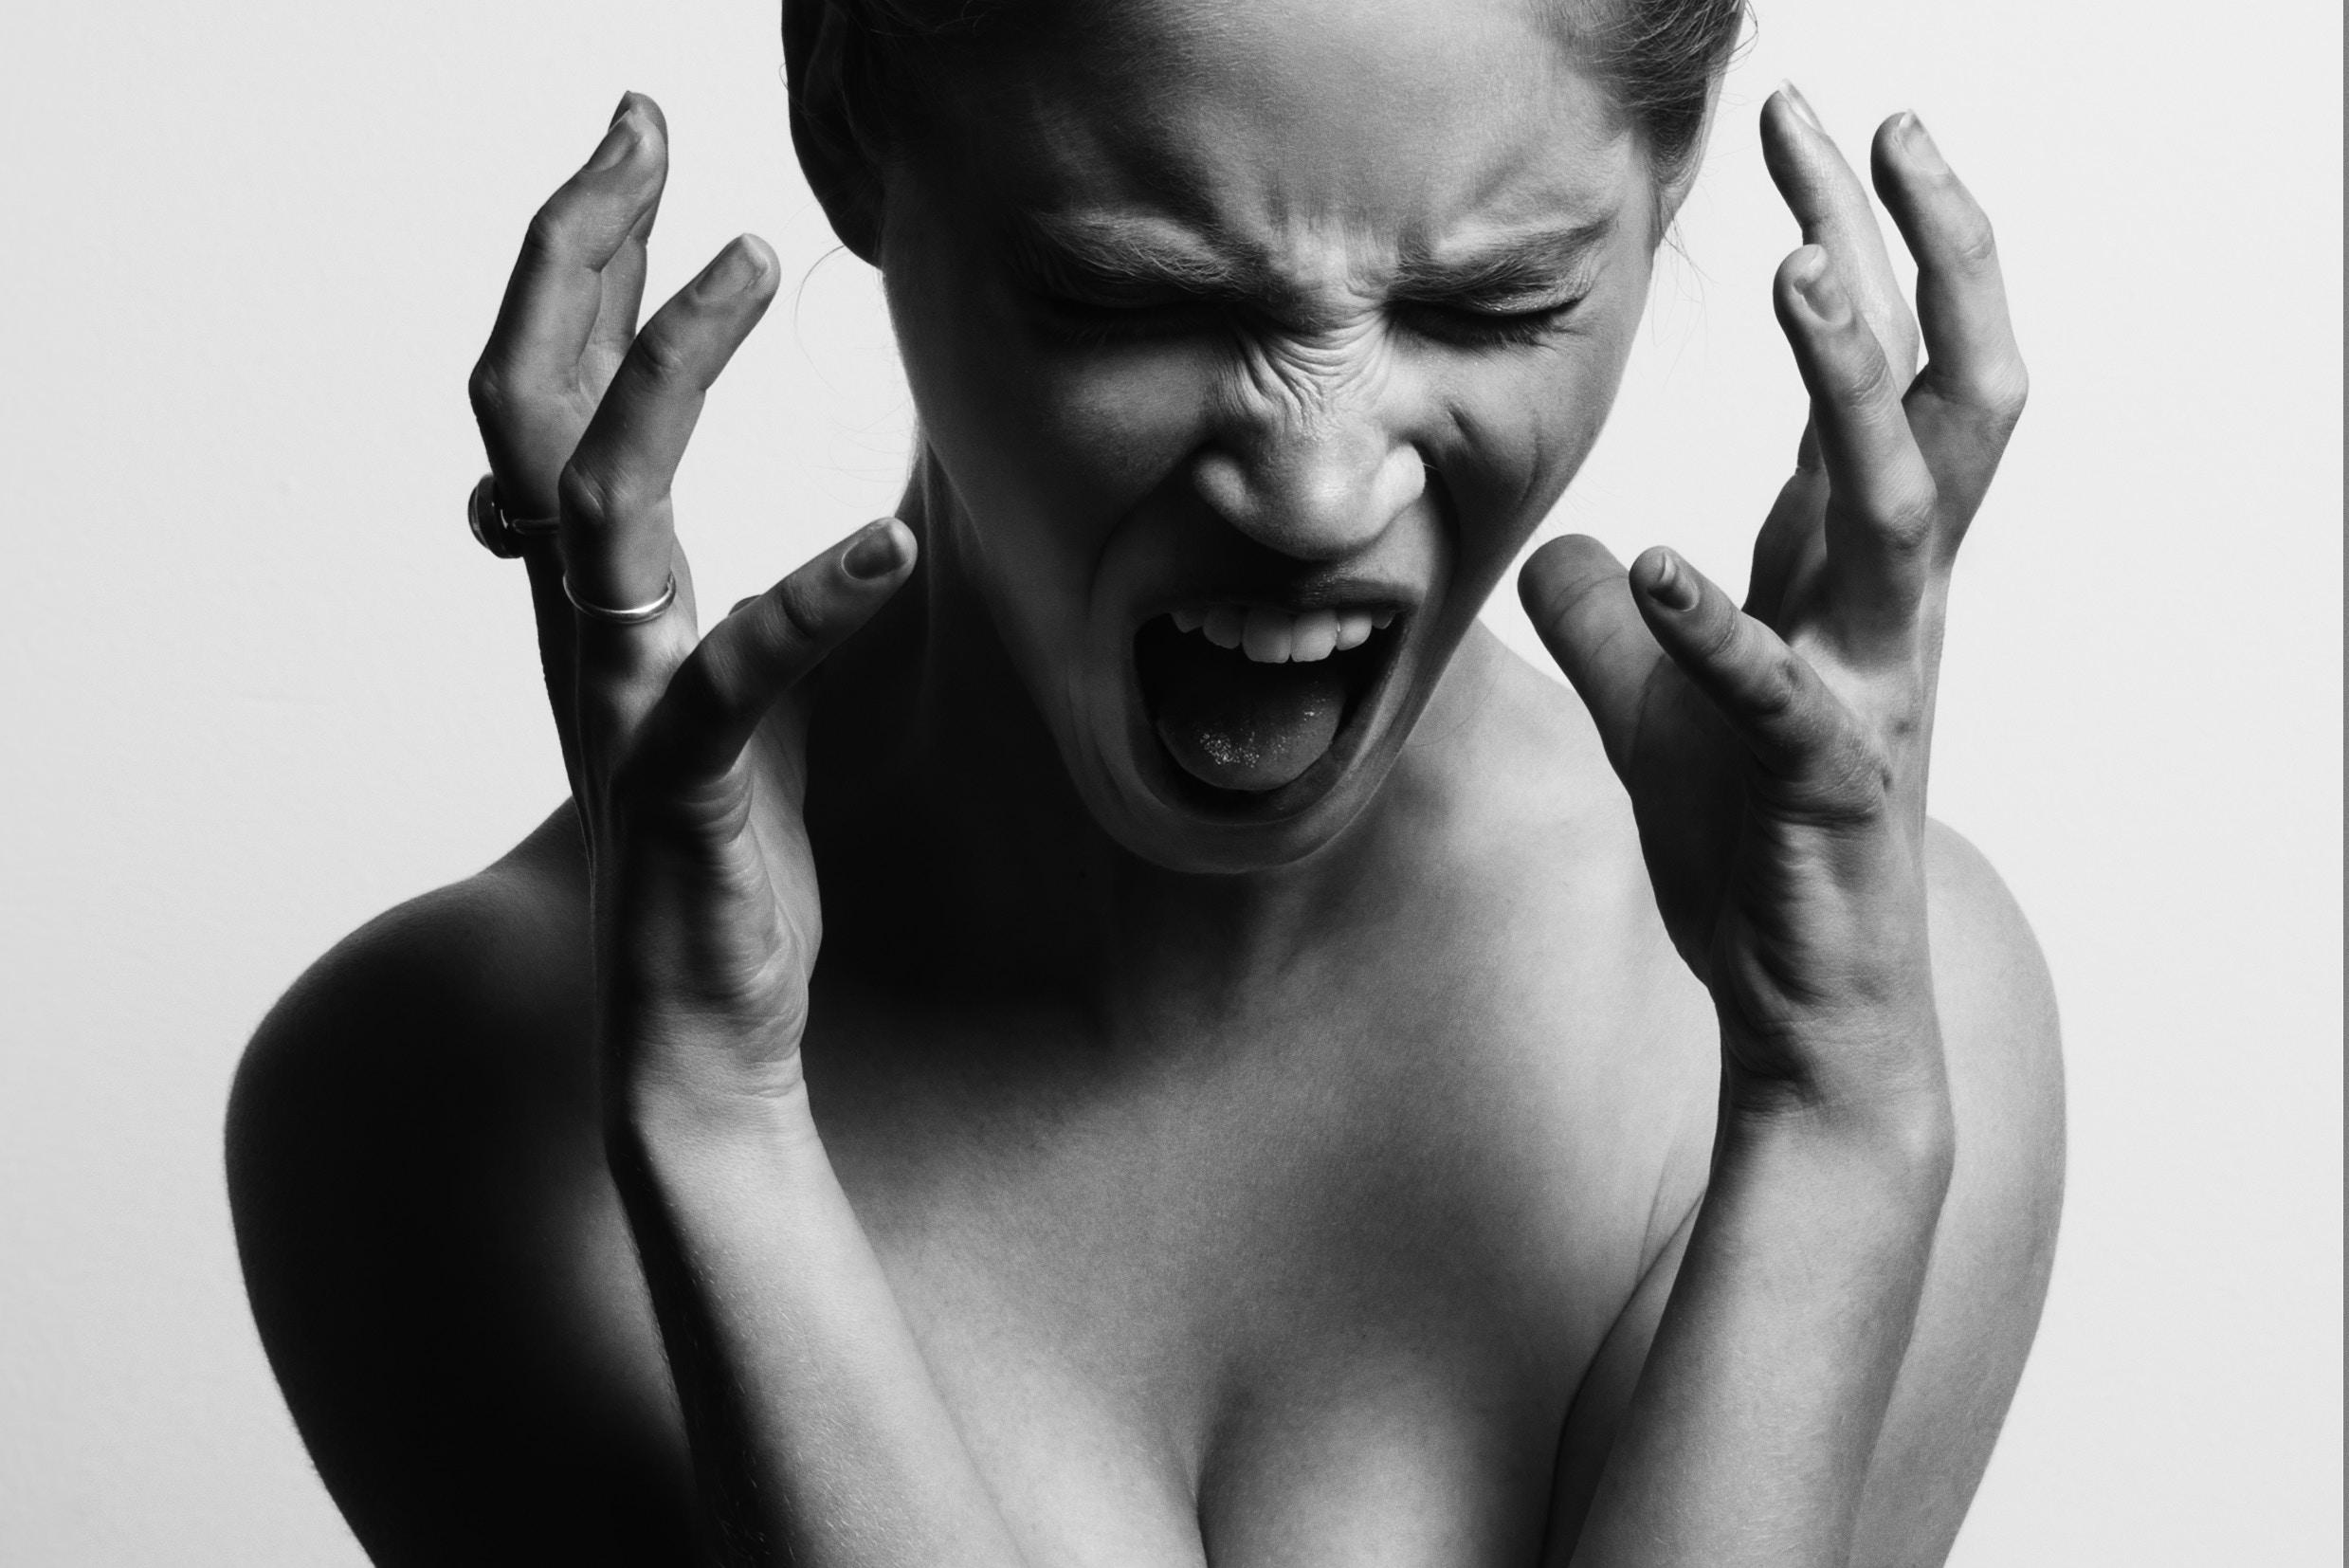 Vulvodoynia, Vulvar Pain Causes and Treatment | photo by gabriel-matula-300398-unsplash.jpg